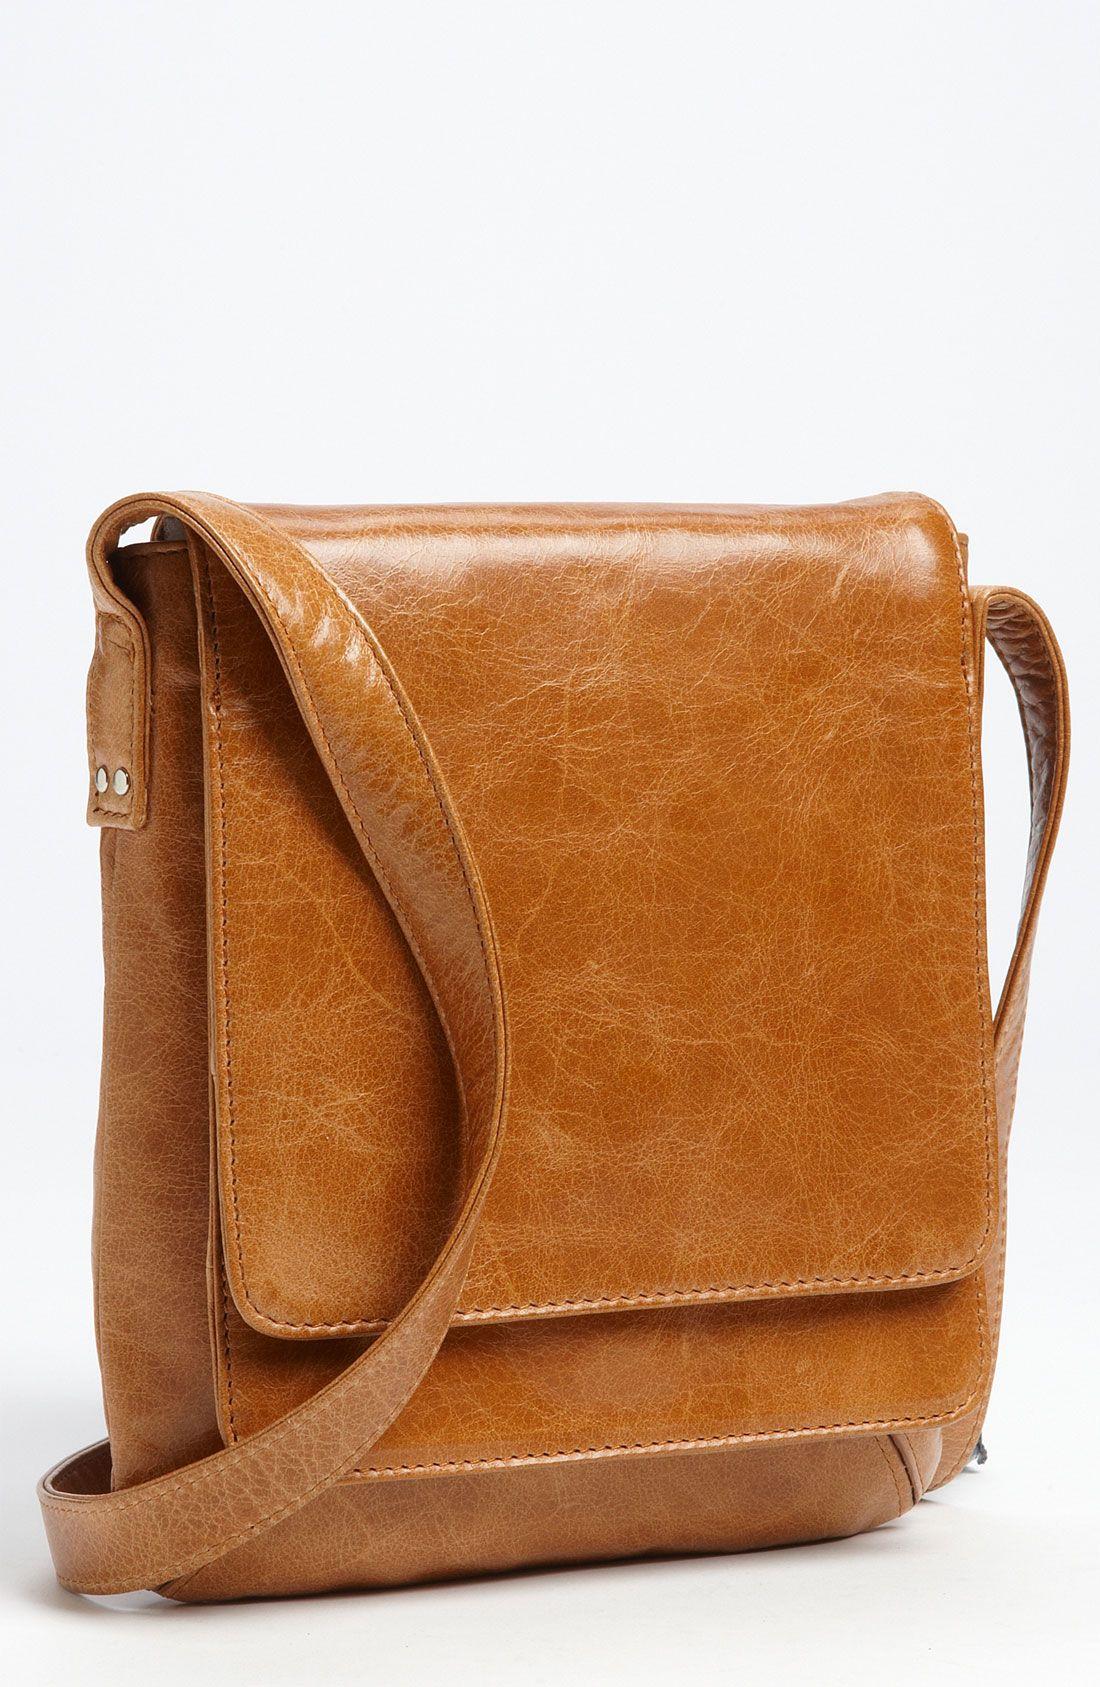 e9fcd2e52 Hobo International - Carly - Caramel Beautiful Bags, Leather Bag, Crossbody  Bag, Satchel